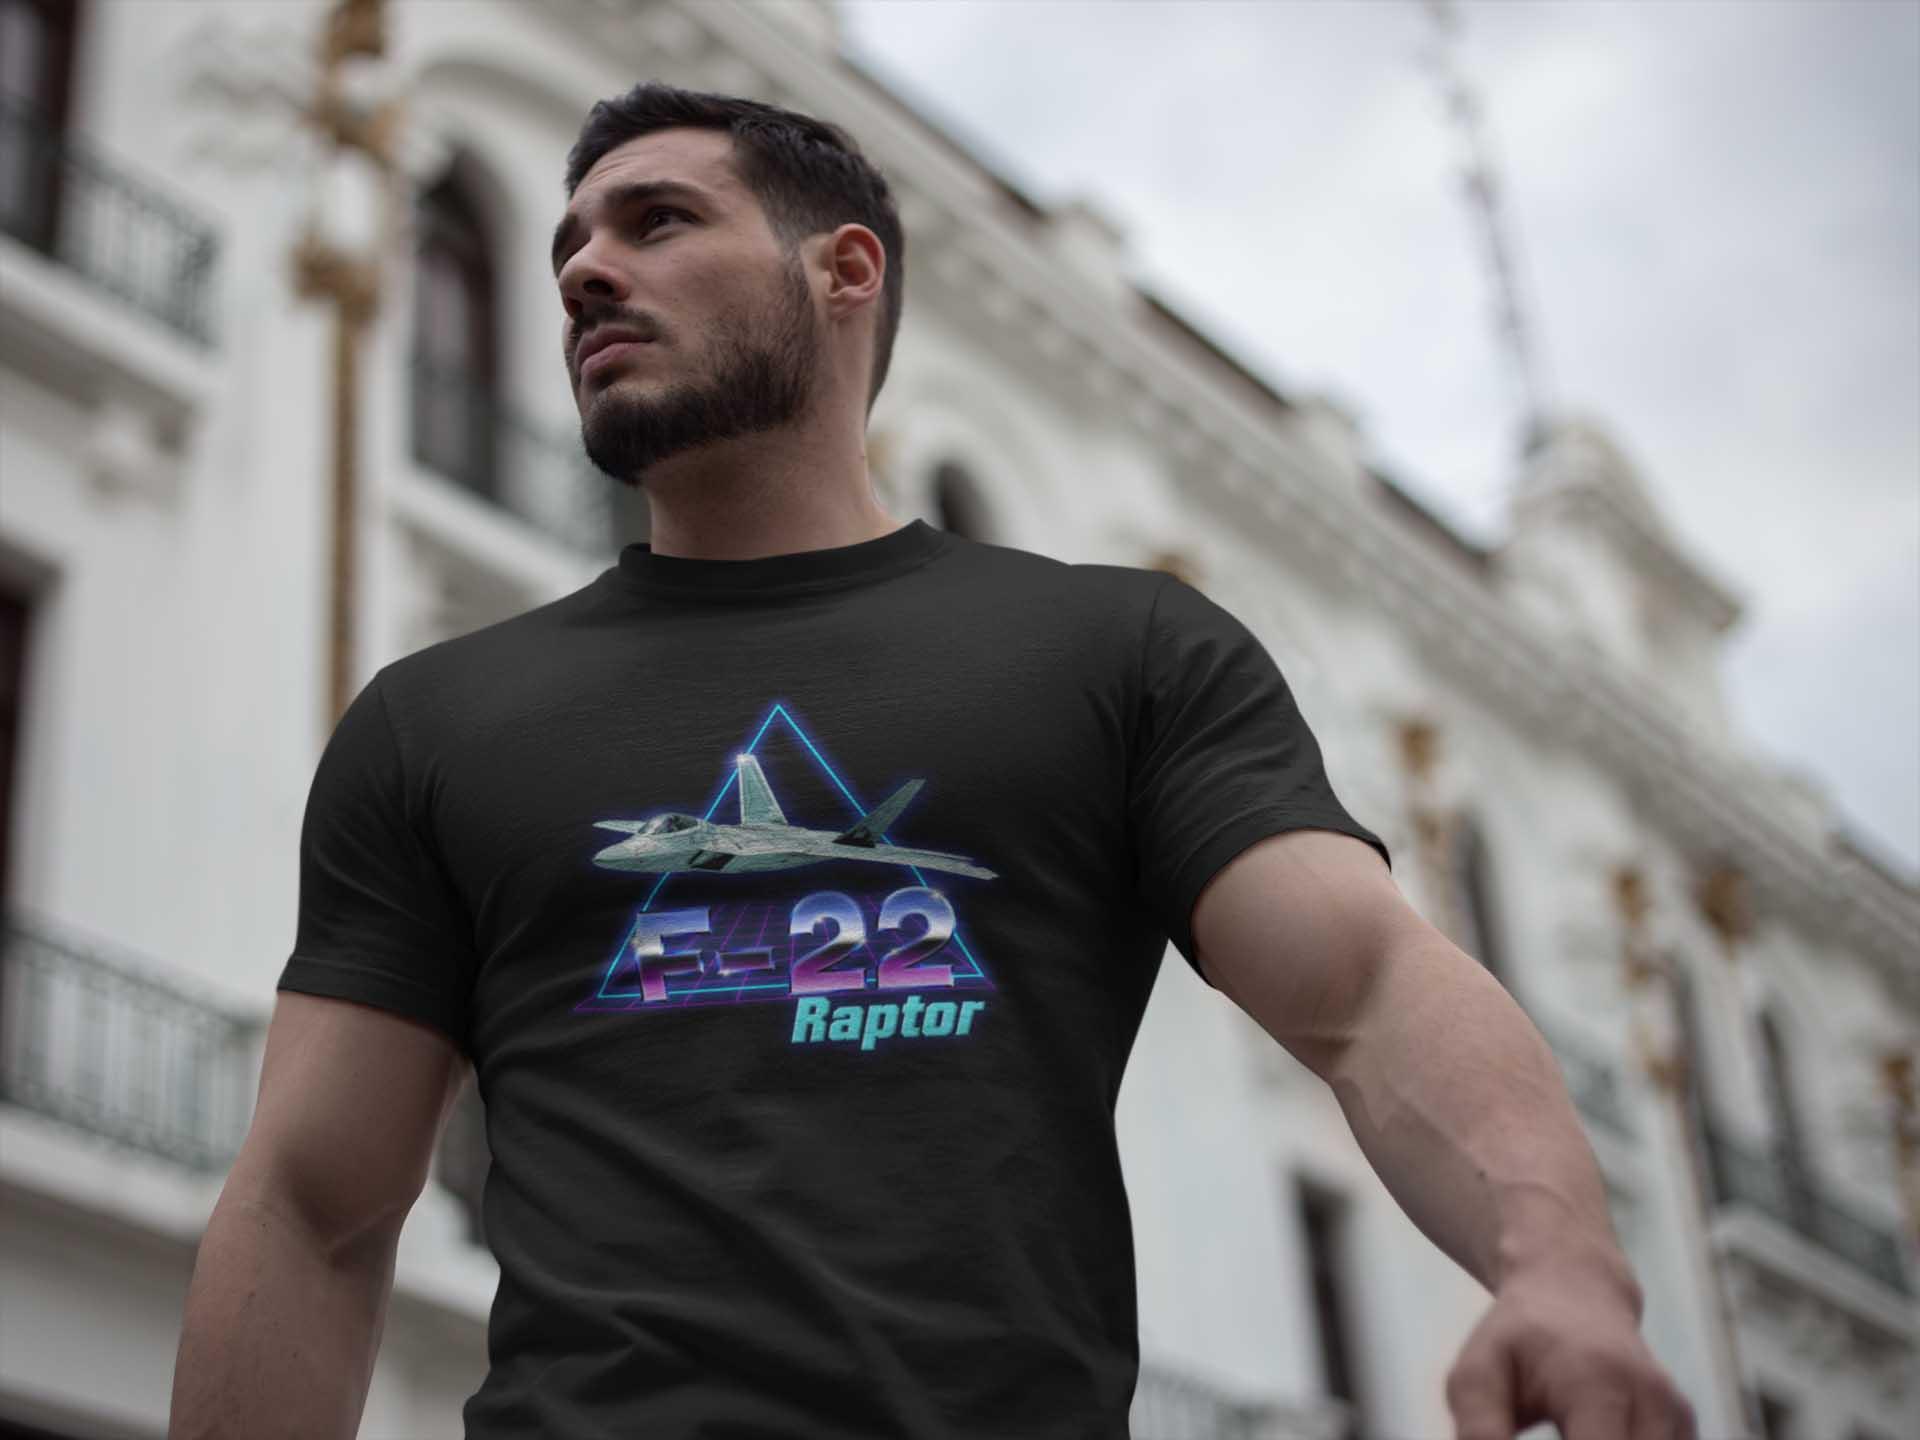 retro f-22 raptor t-shirt